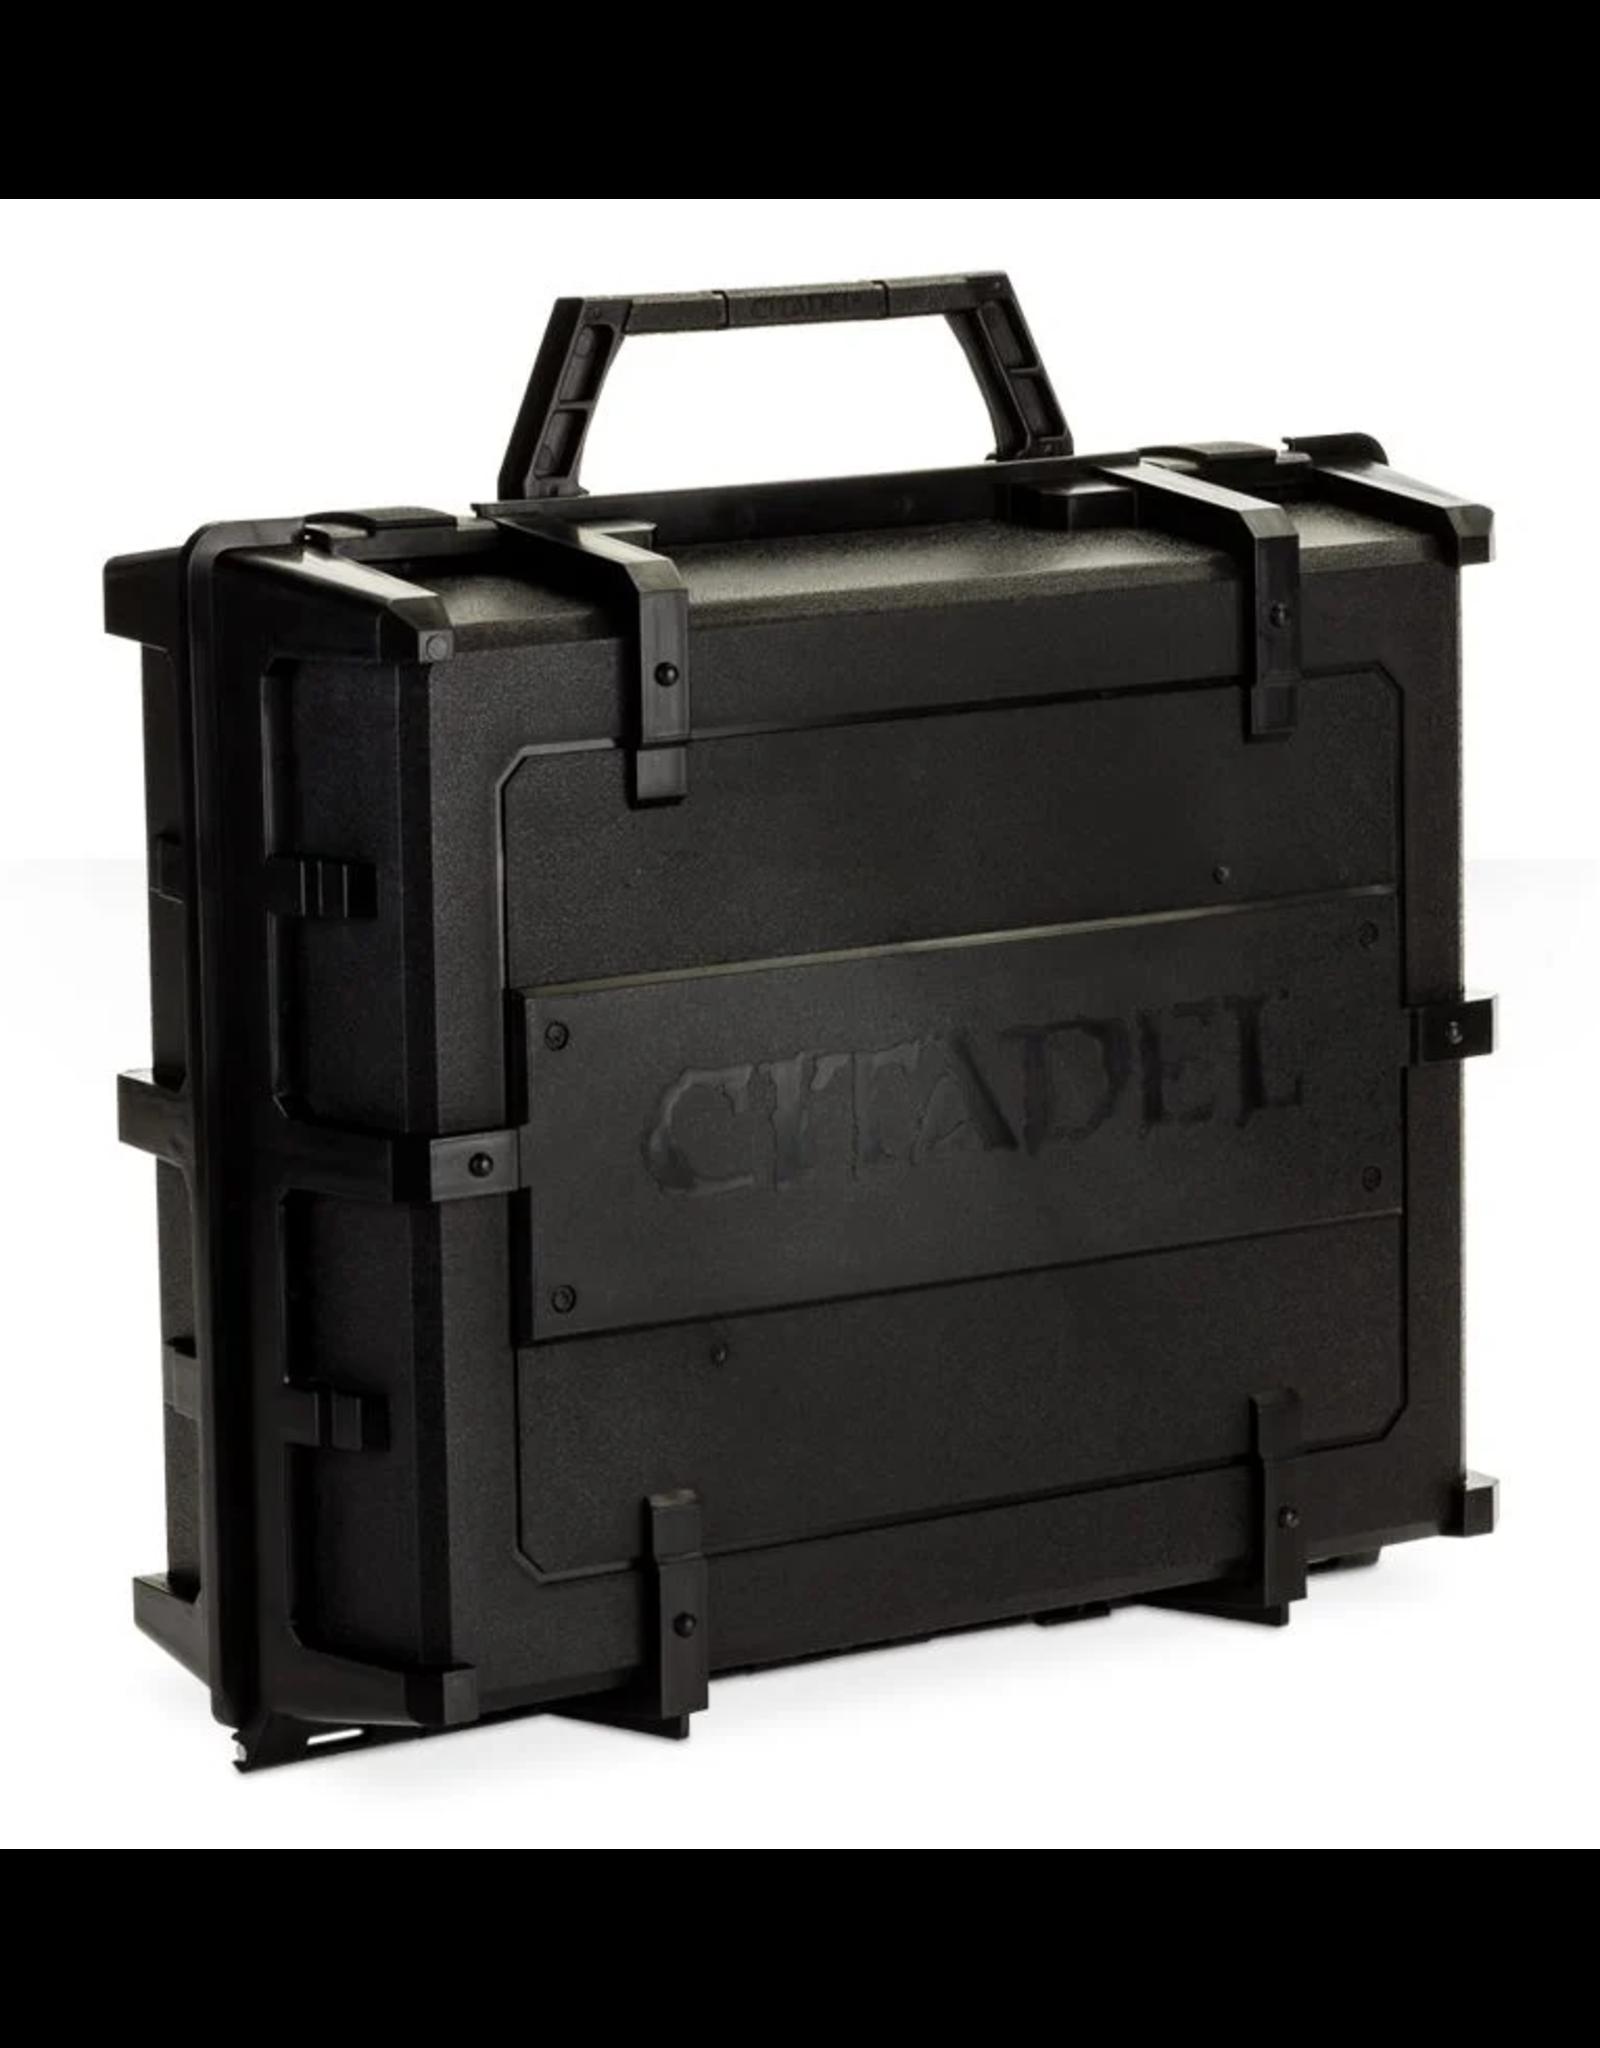 Citadel Citadel Skirmish Kit Figure Case